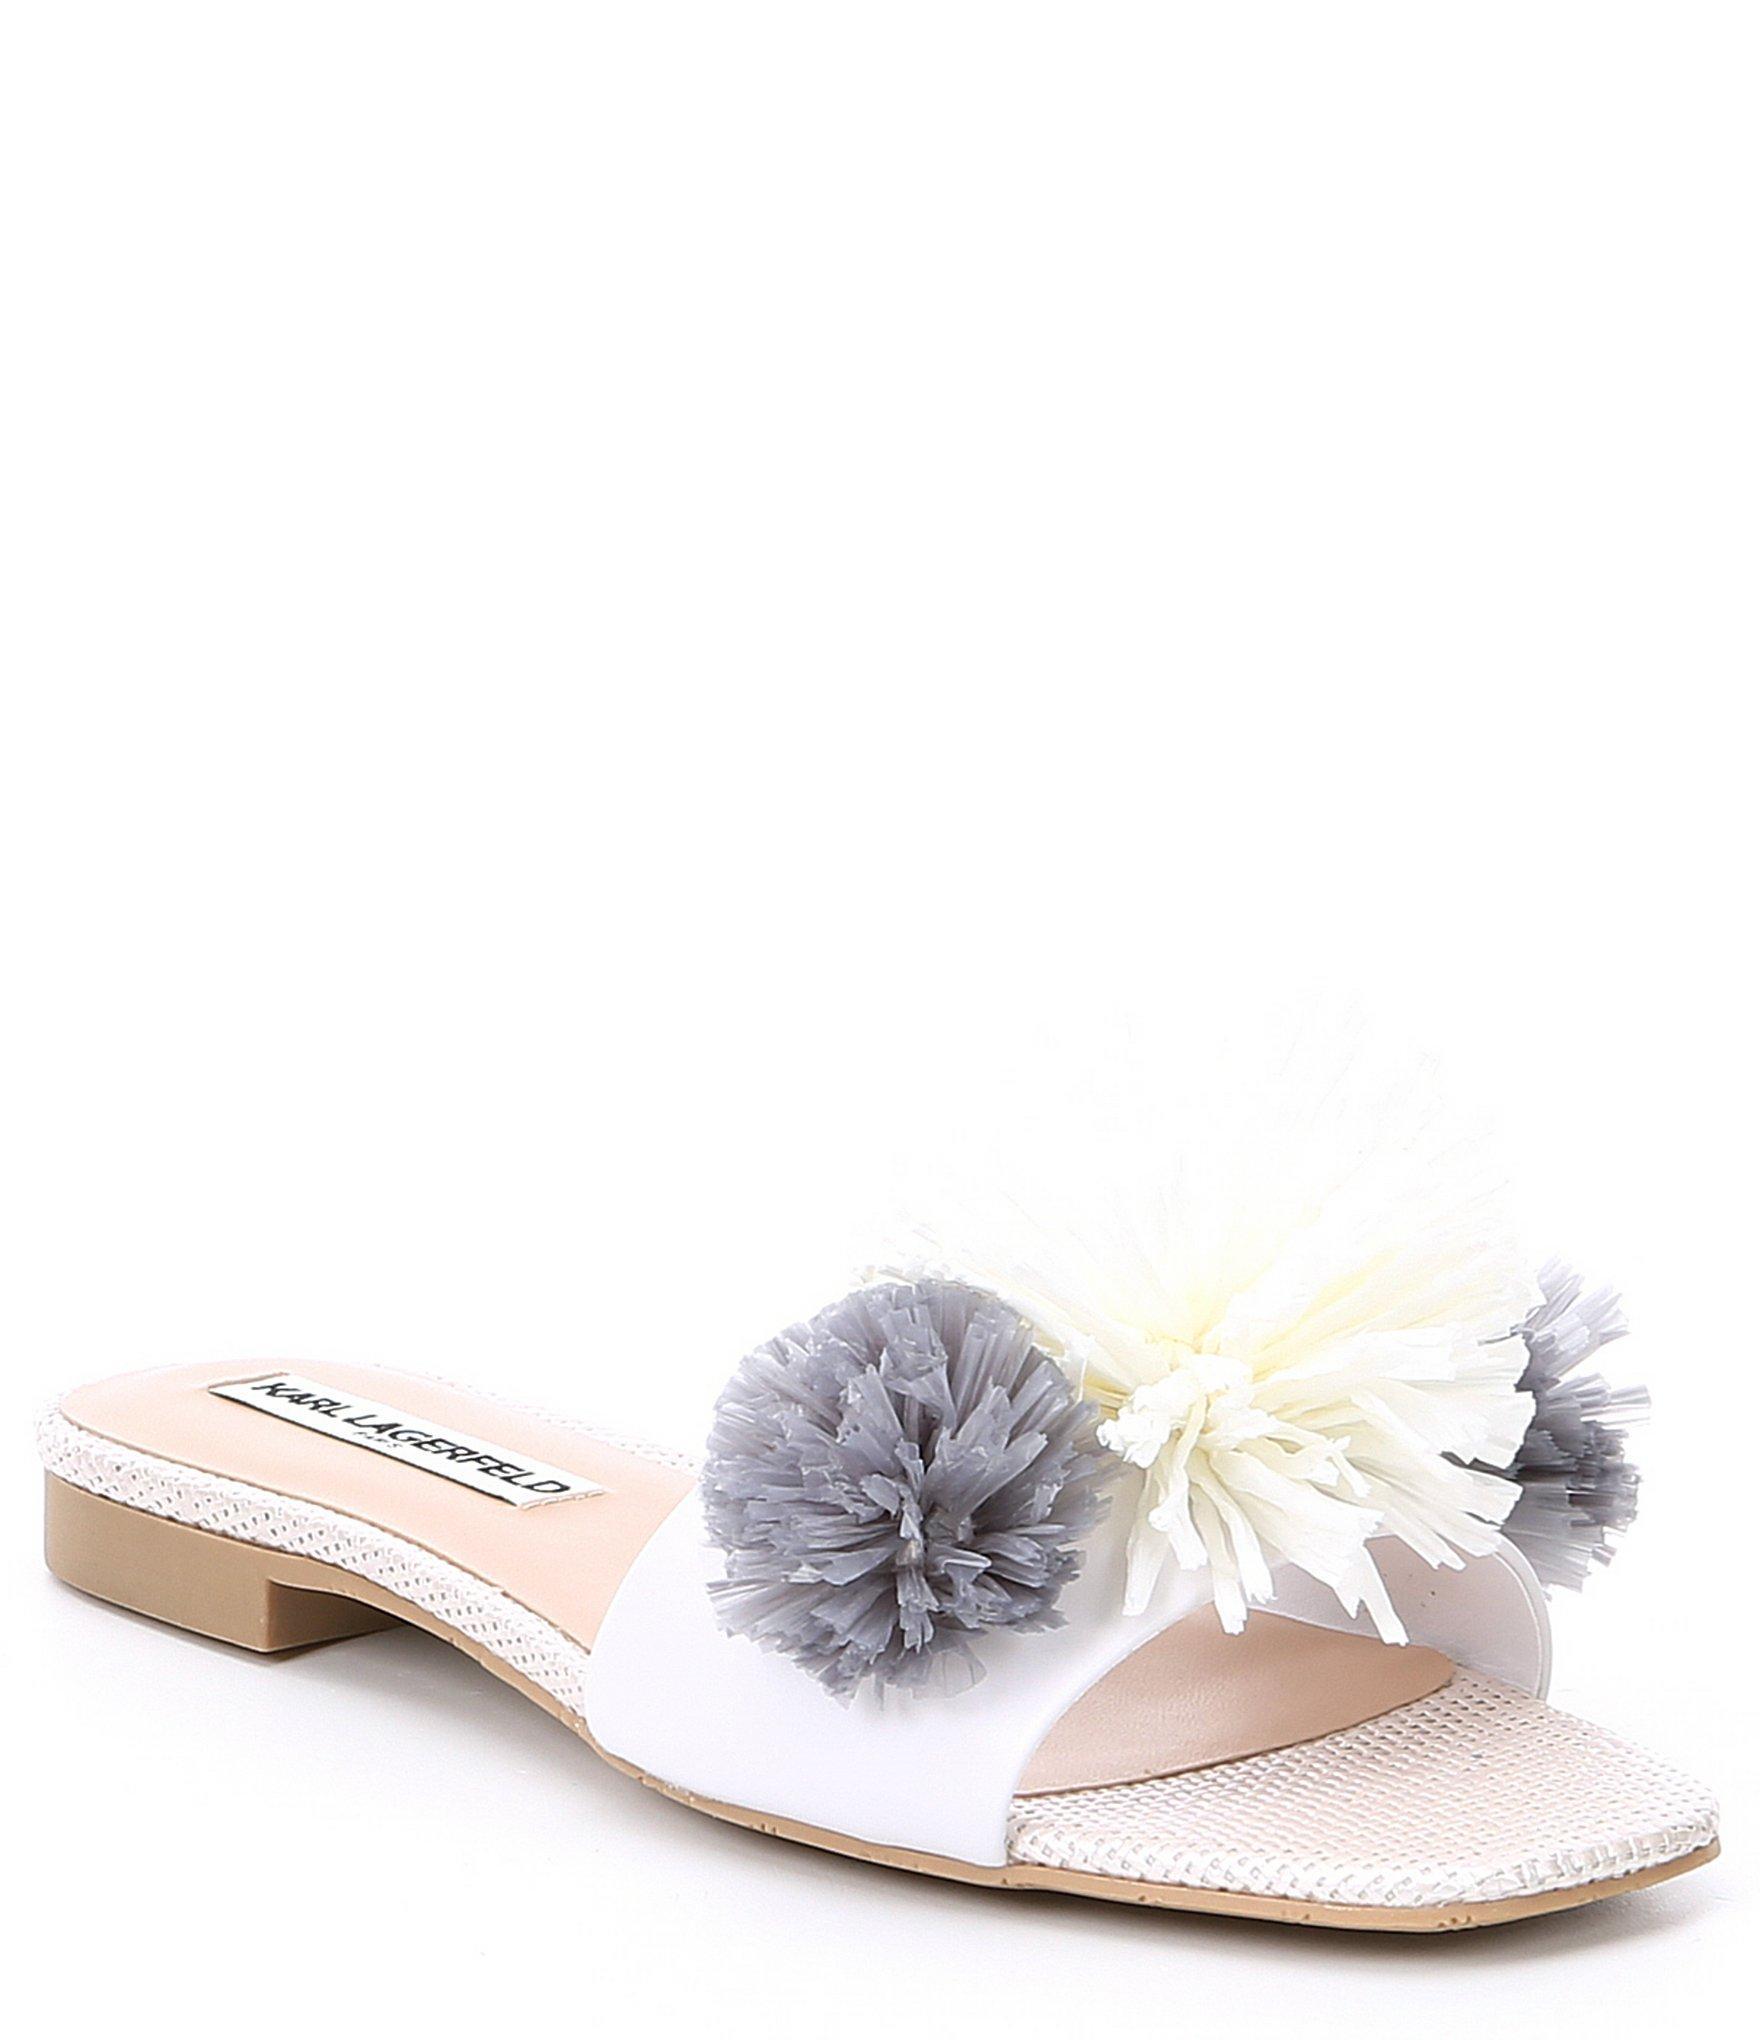 b52aa0919876 Lyst - Karl Lagerfeld Rainey Leather Pom Pom Slides in White - Save 42%